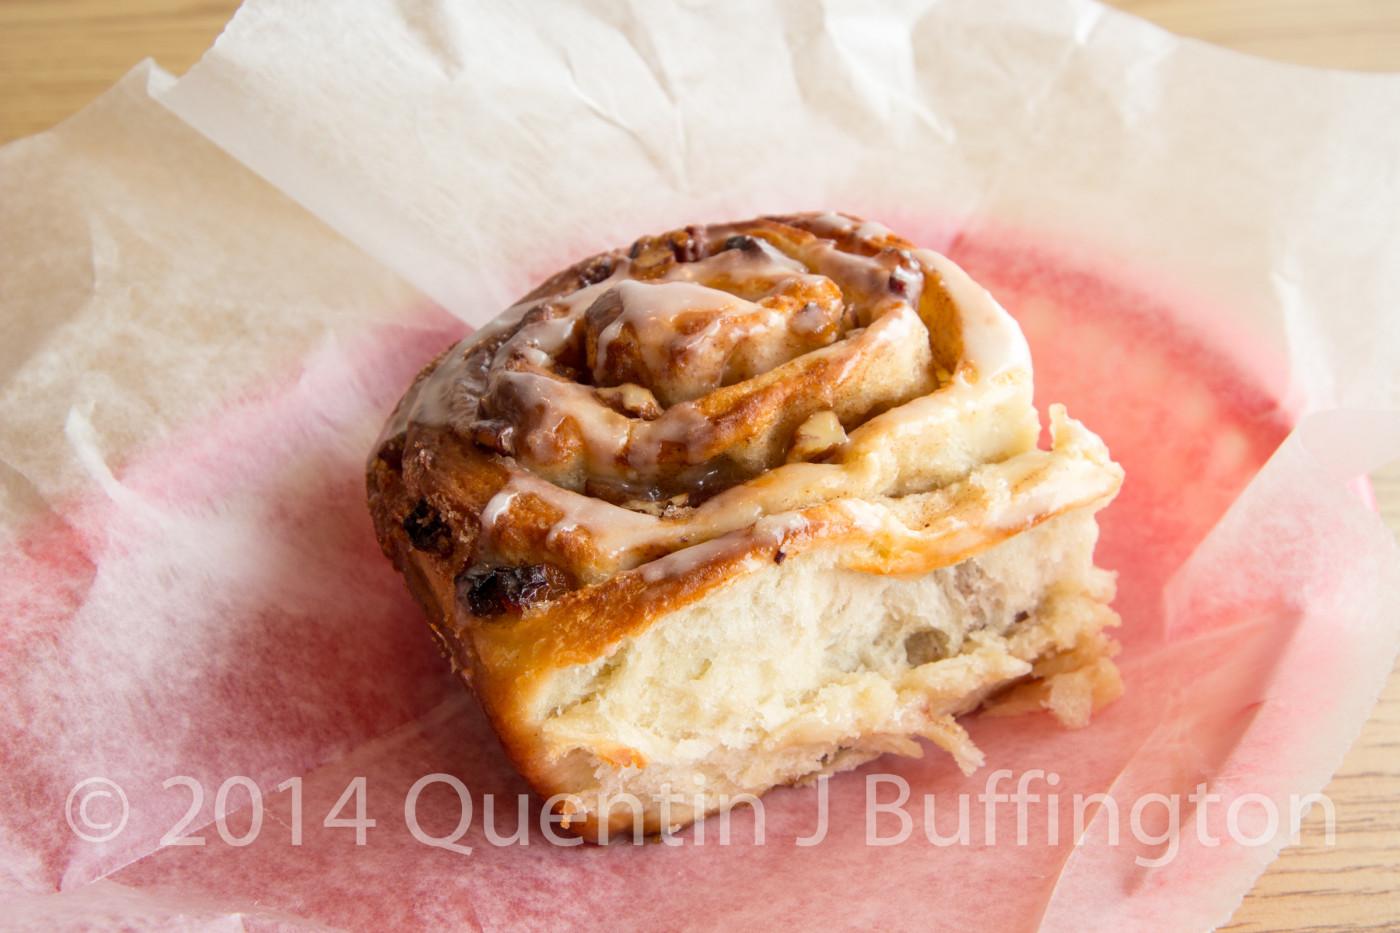 A piping hot fresh Bacon Cinnamon Roll fresh from the ovens at Mareta Deli in LaSalle Illinois.